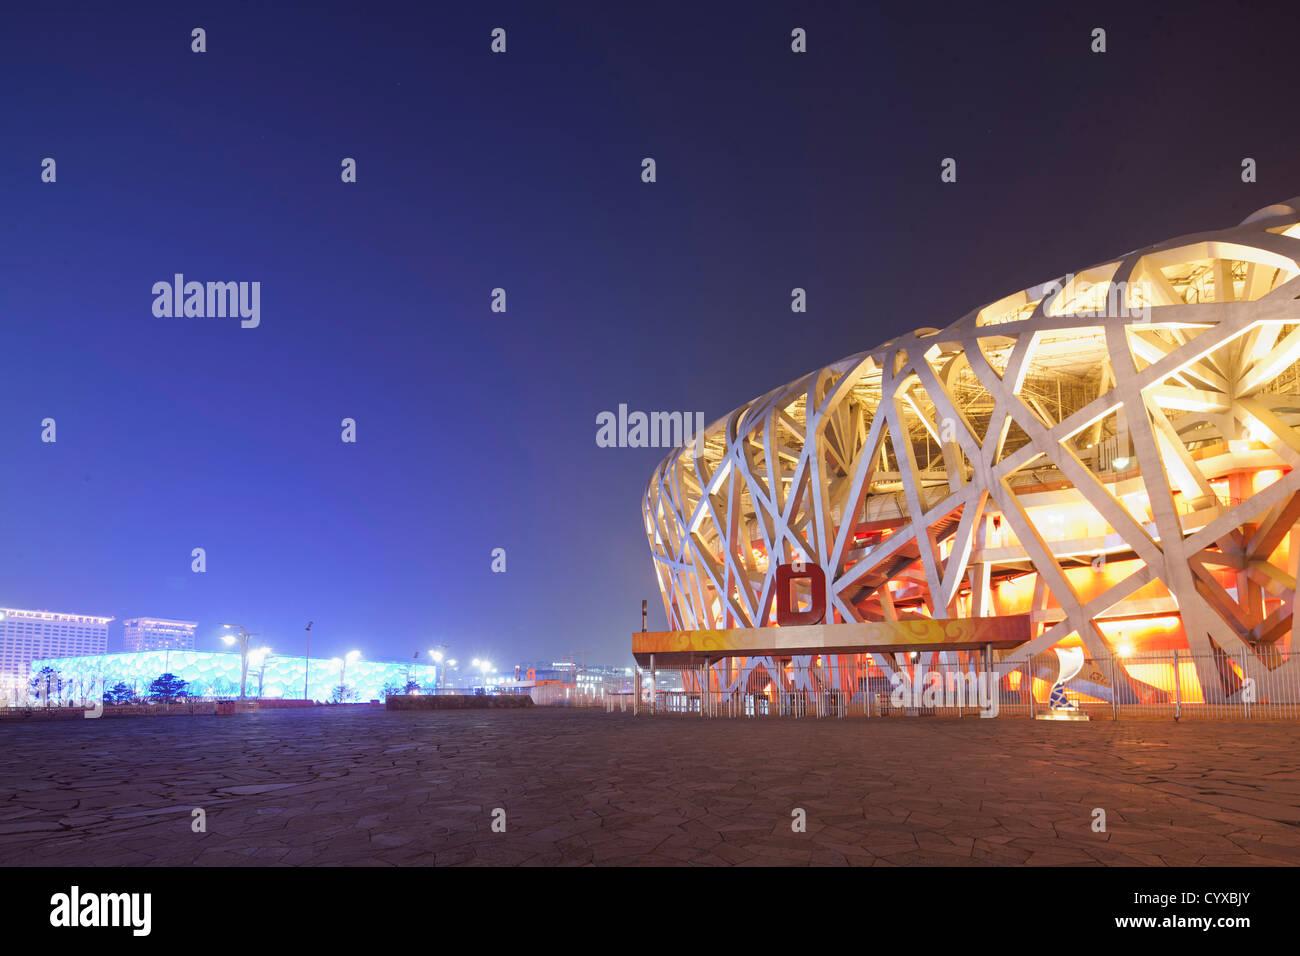 China, Beijing, Estadio Nacional de noche Imagen De Stock